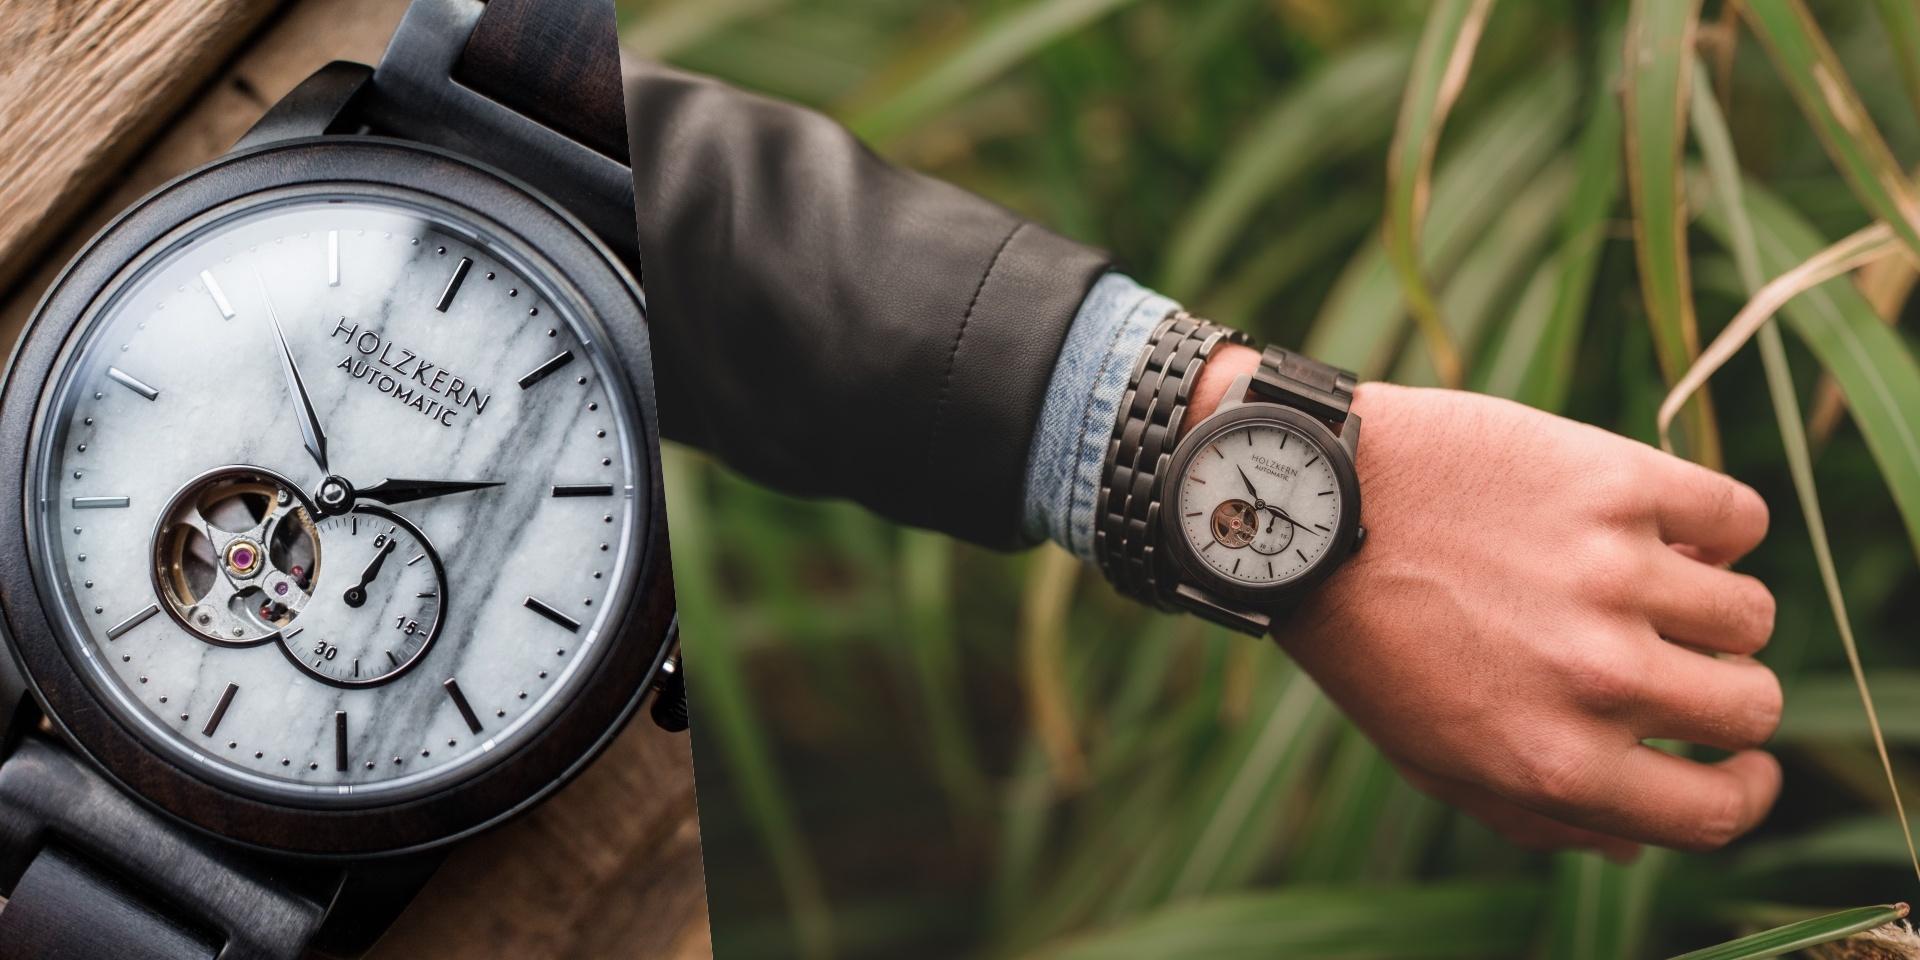 Holzkernuhr Manhattan mit Armband Kanon